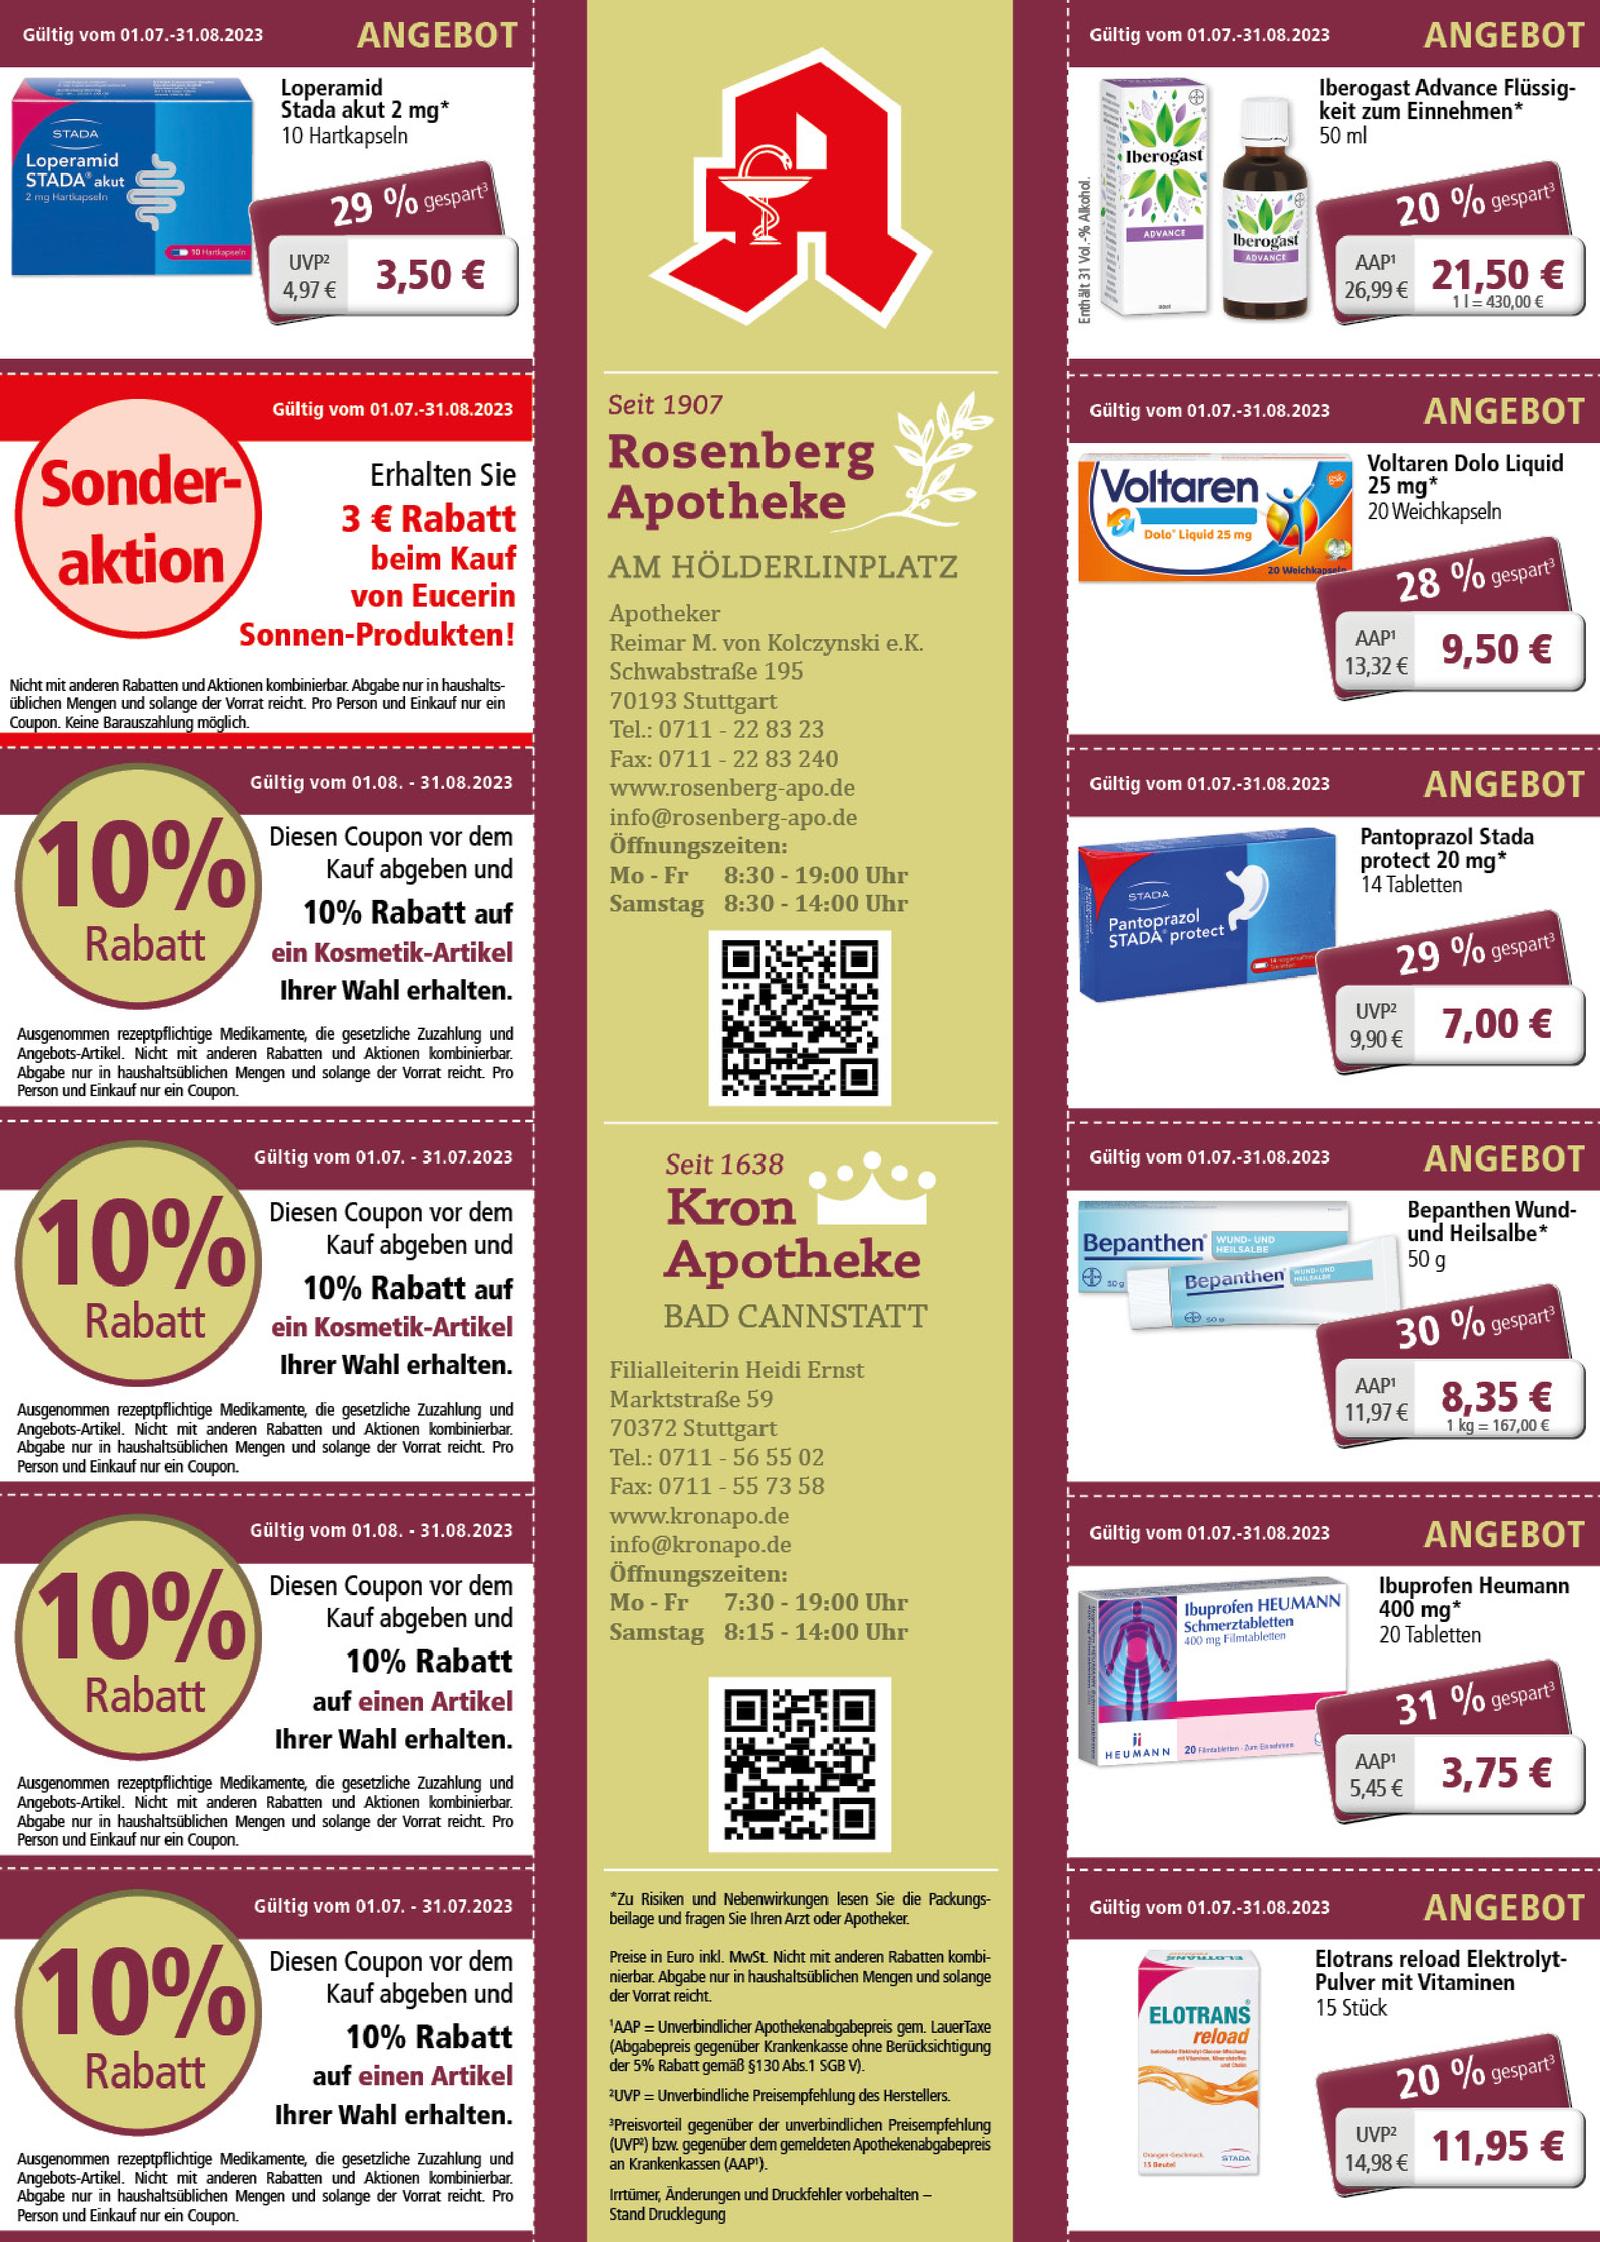 https://mein-uploads.apocdn.net/5268/leaflets/5268_flyer-Seite1.png